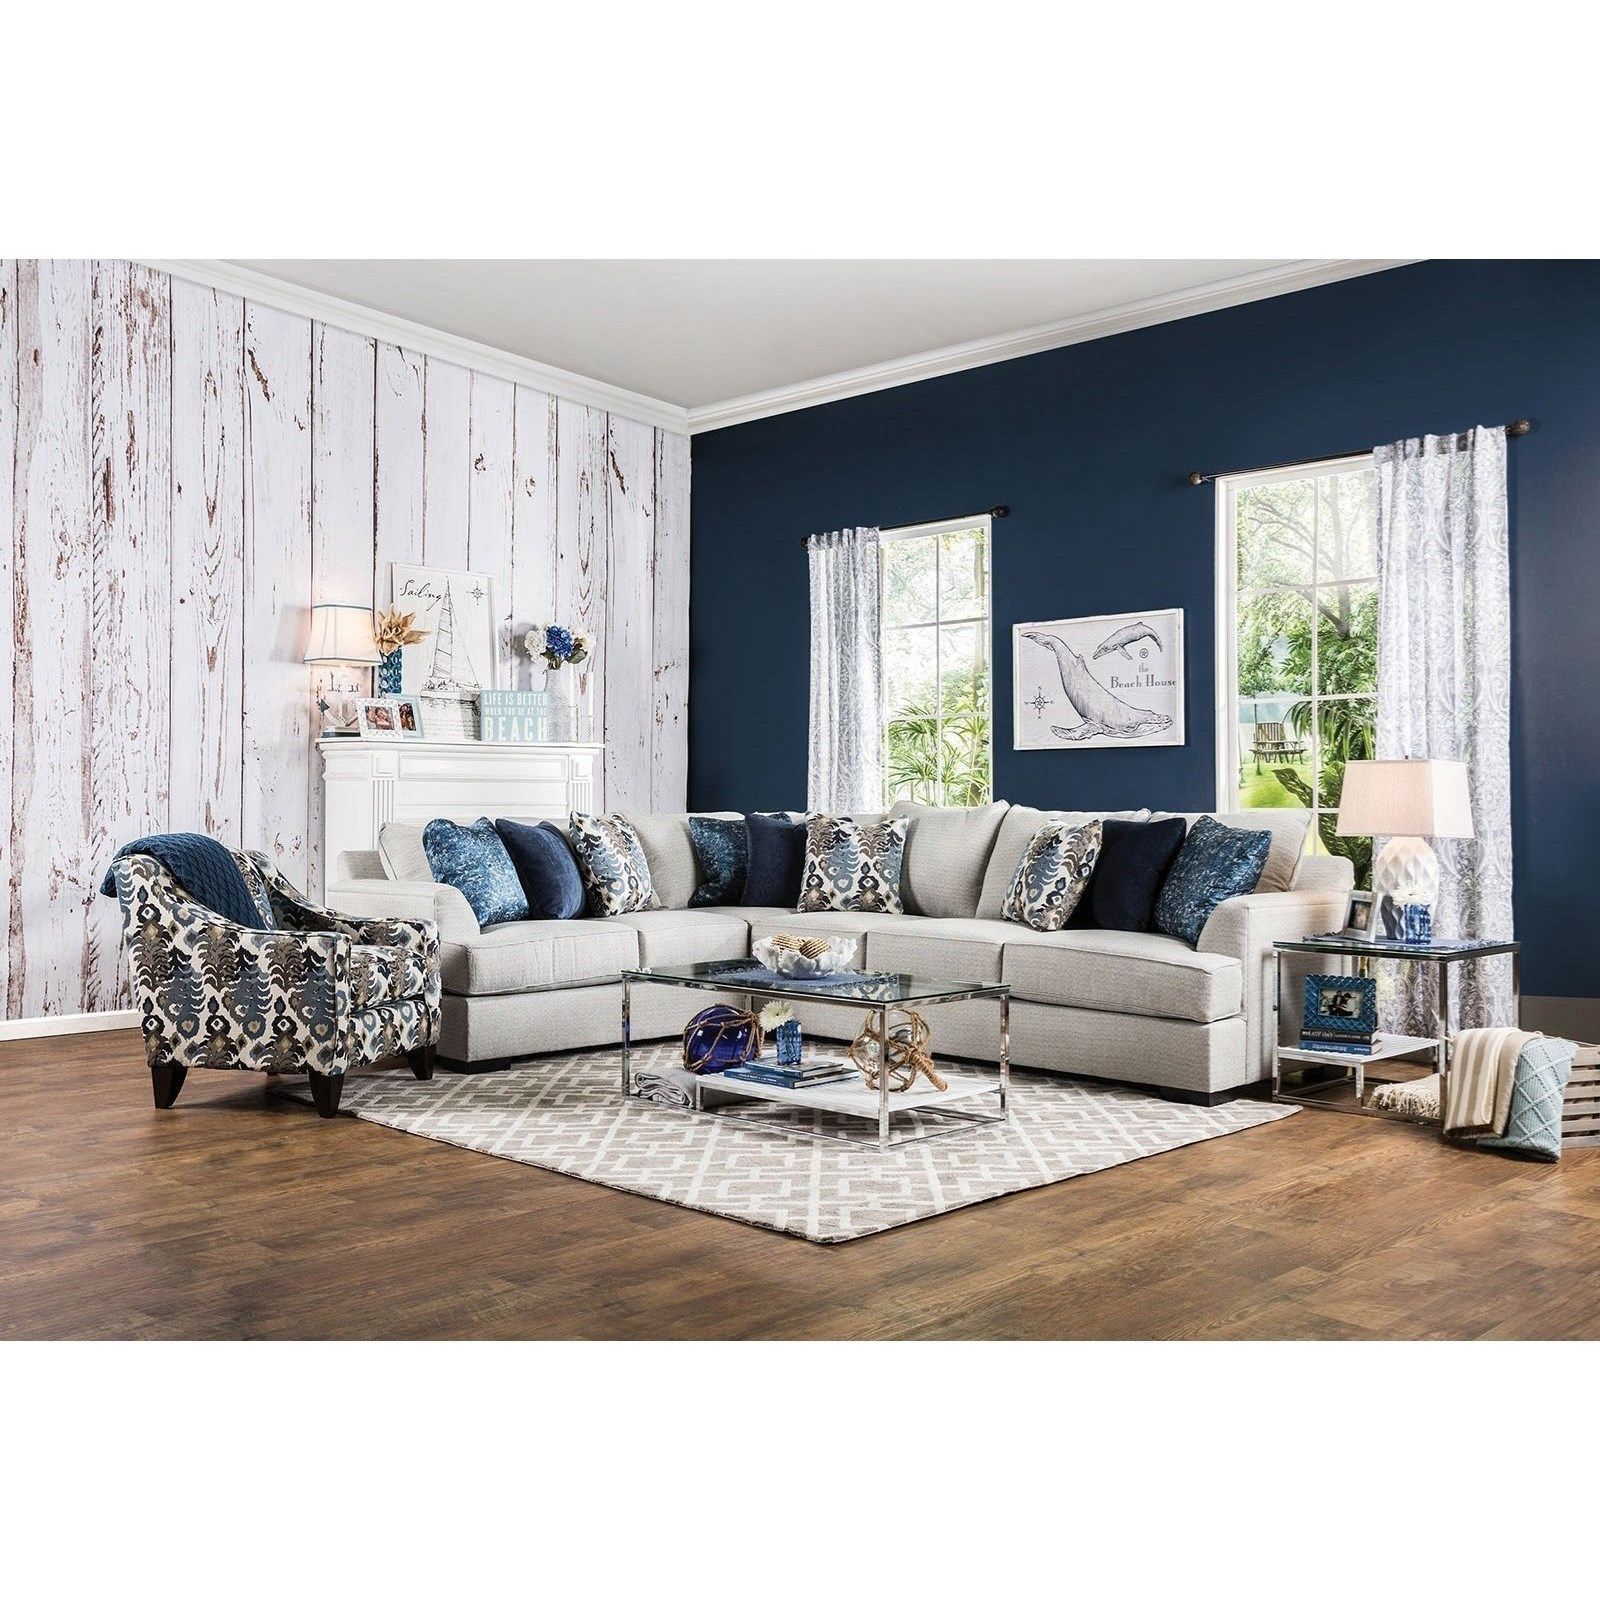 Attirant Nassau Furniture